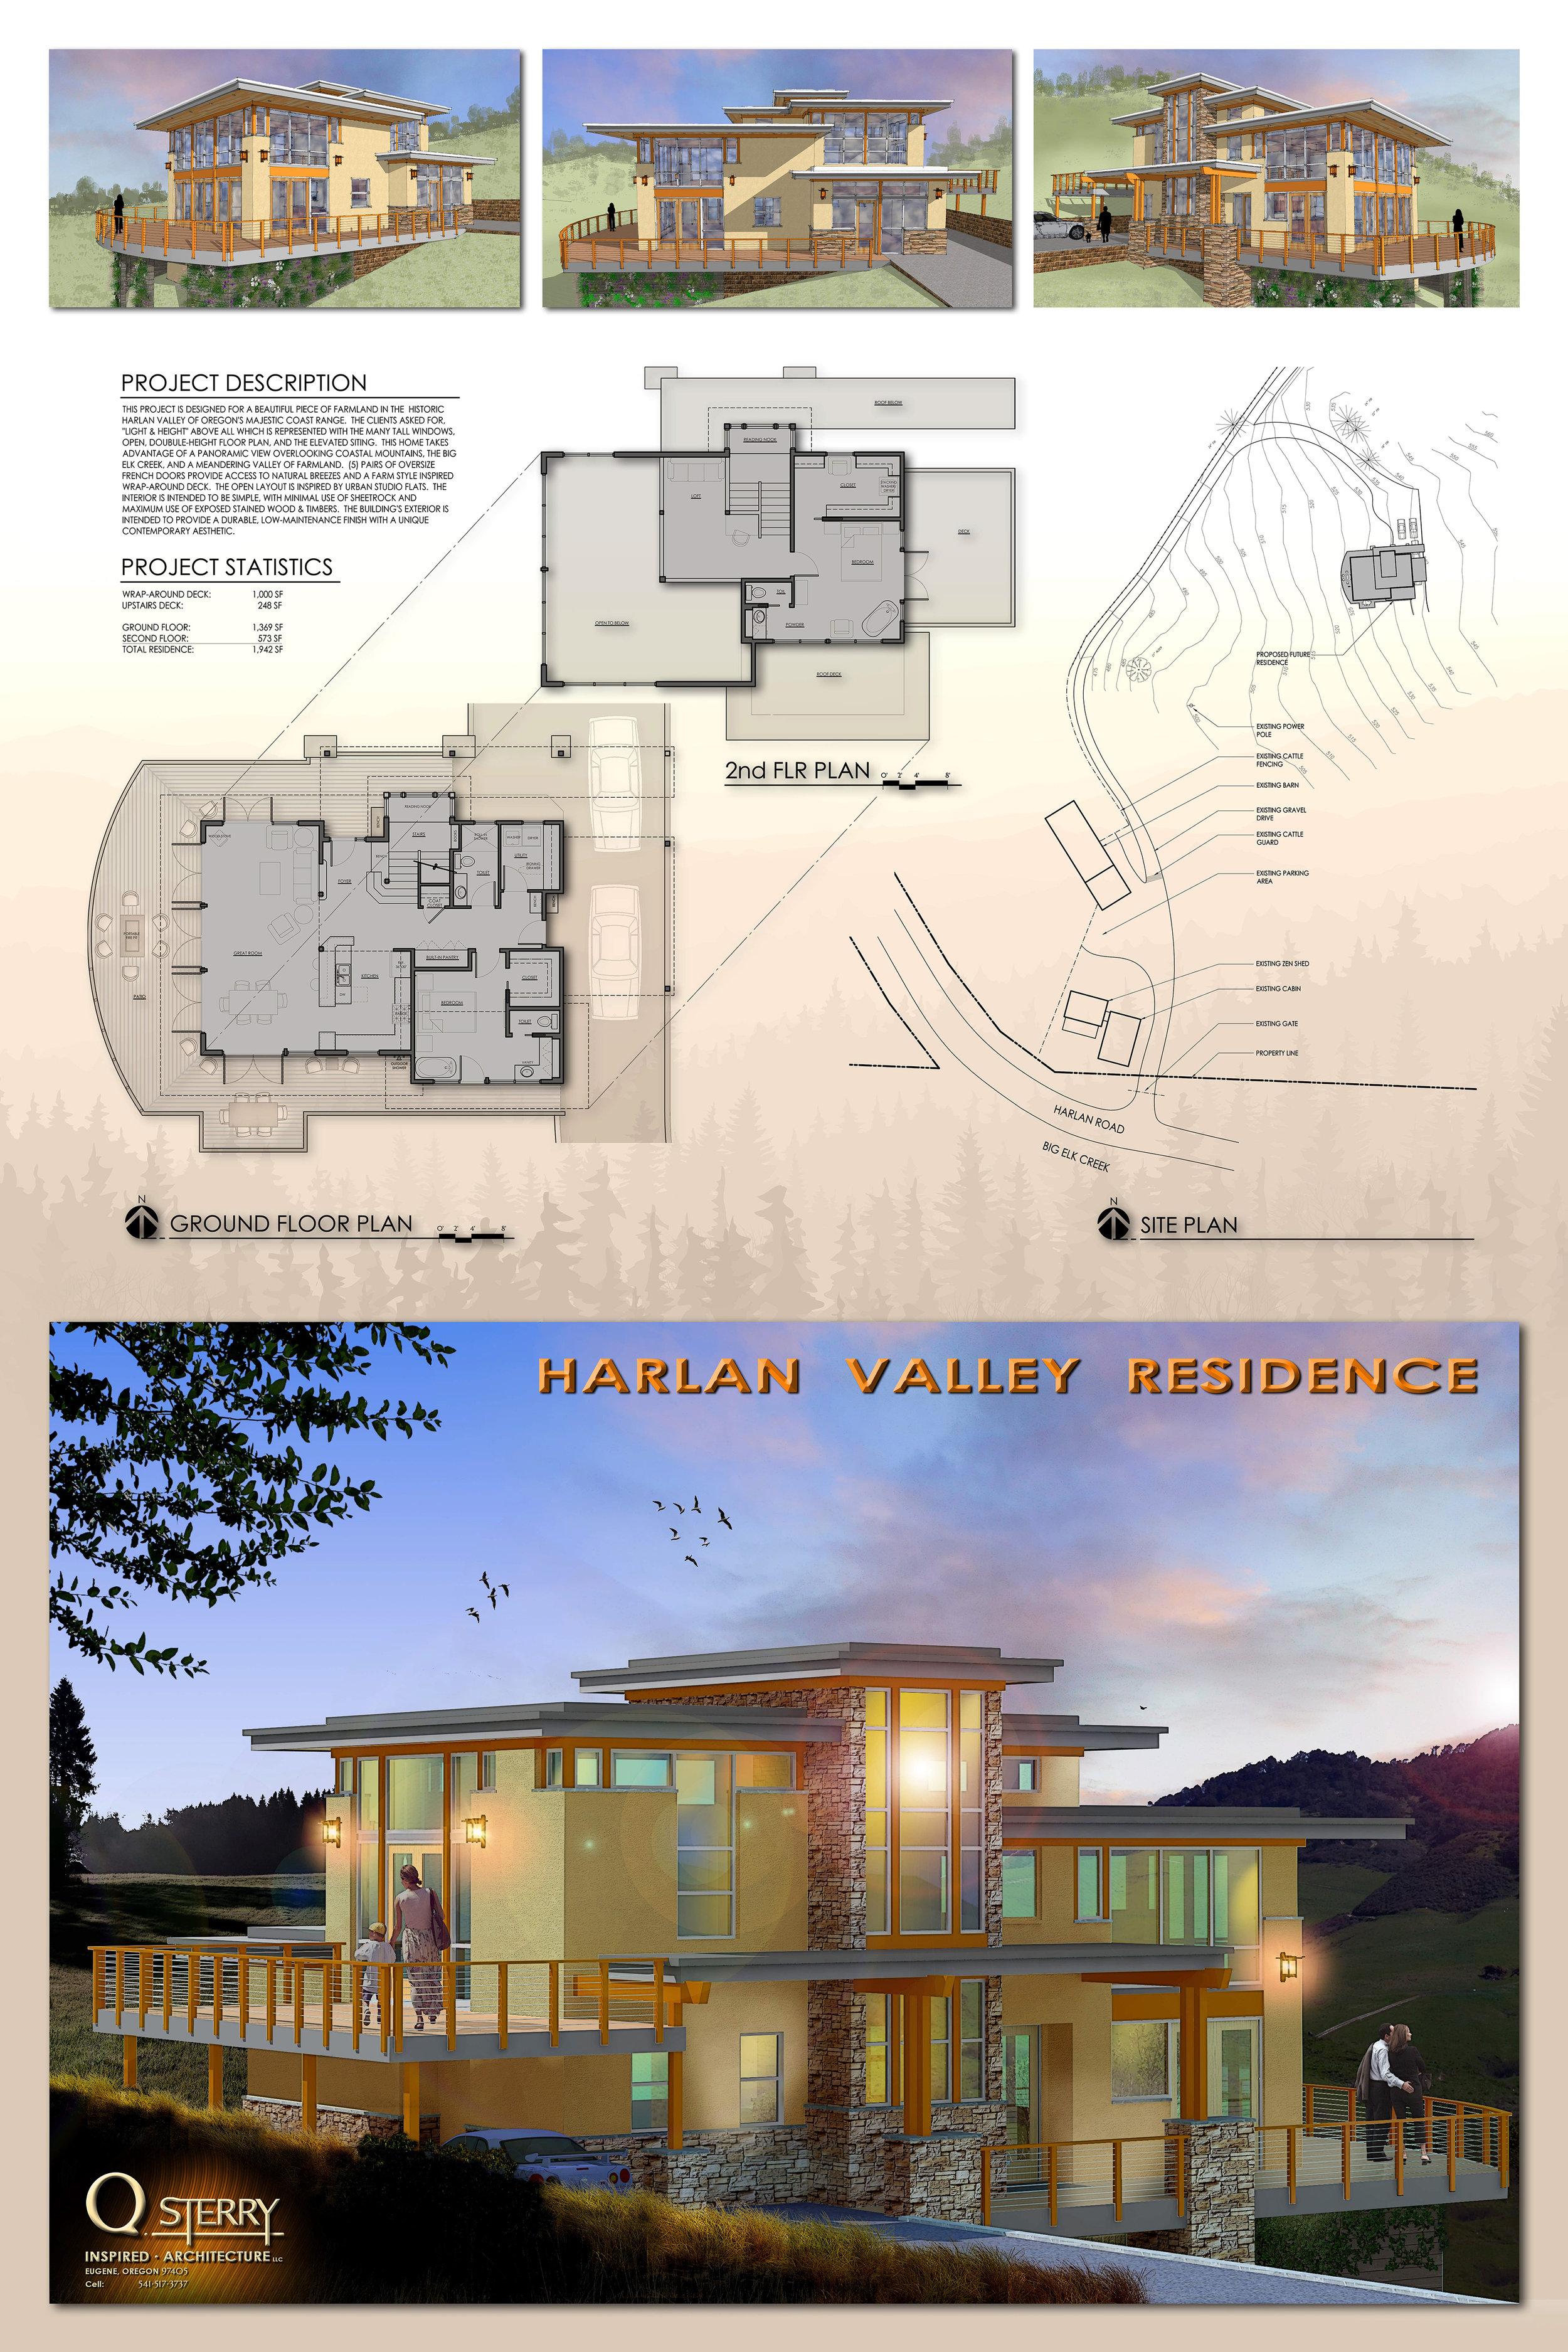 29_harlan_valley_residence_-_pca_-_unbuilt_category.jpg